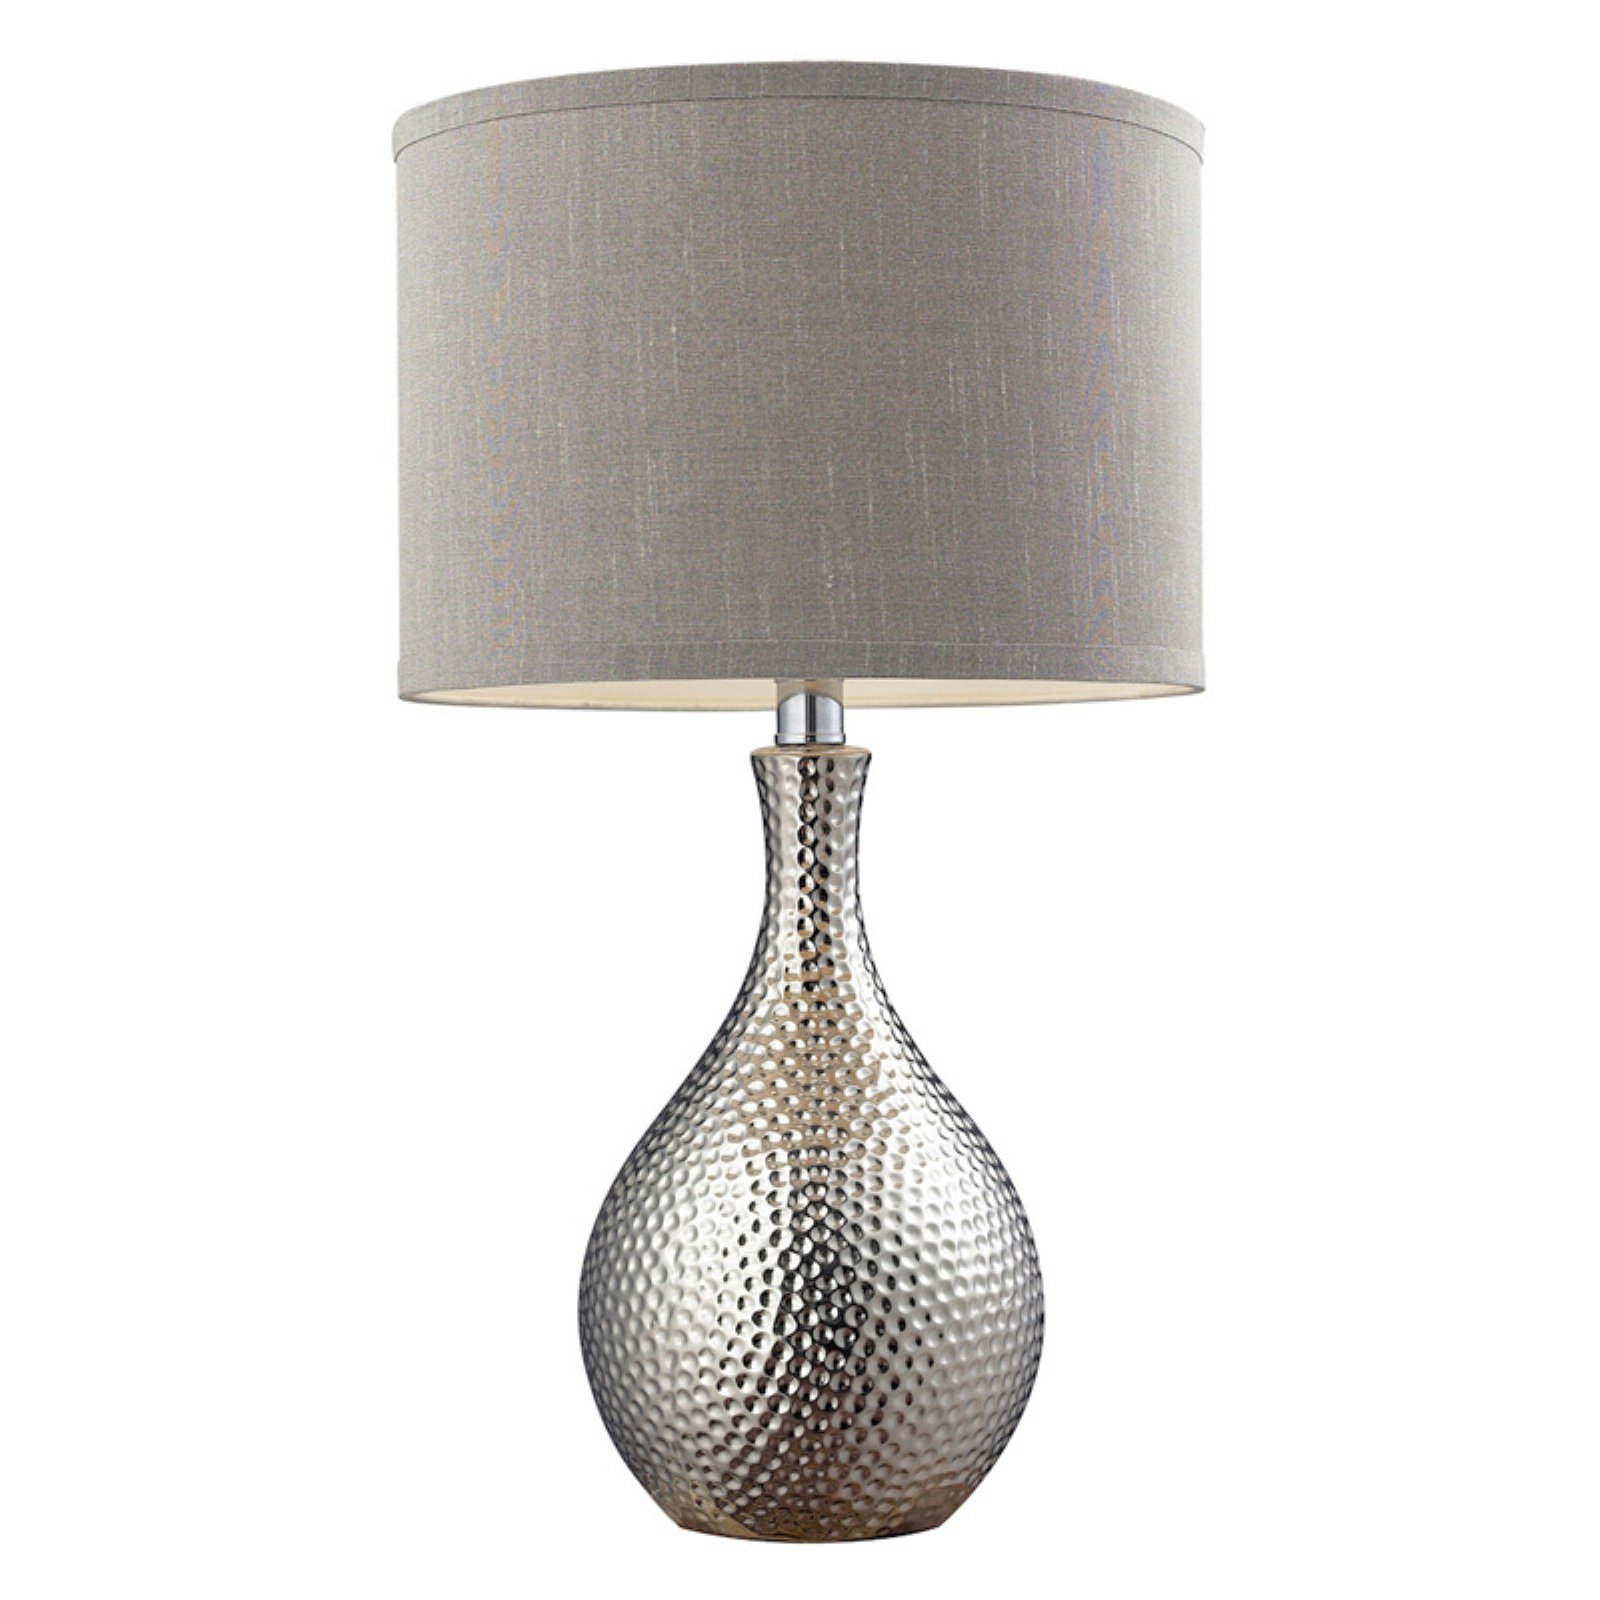 Dimond Lighting Hammered Chrome Plated Table Lamp Walmartcom